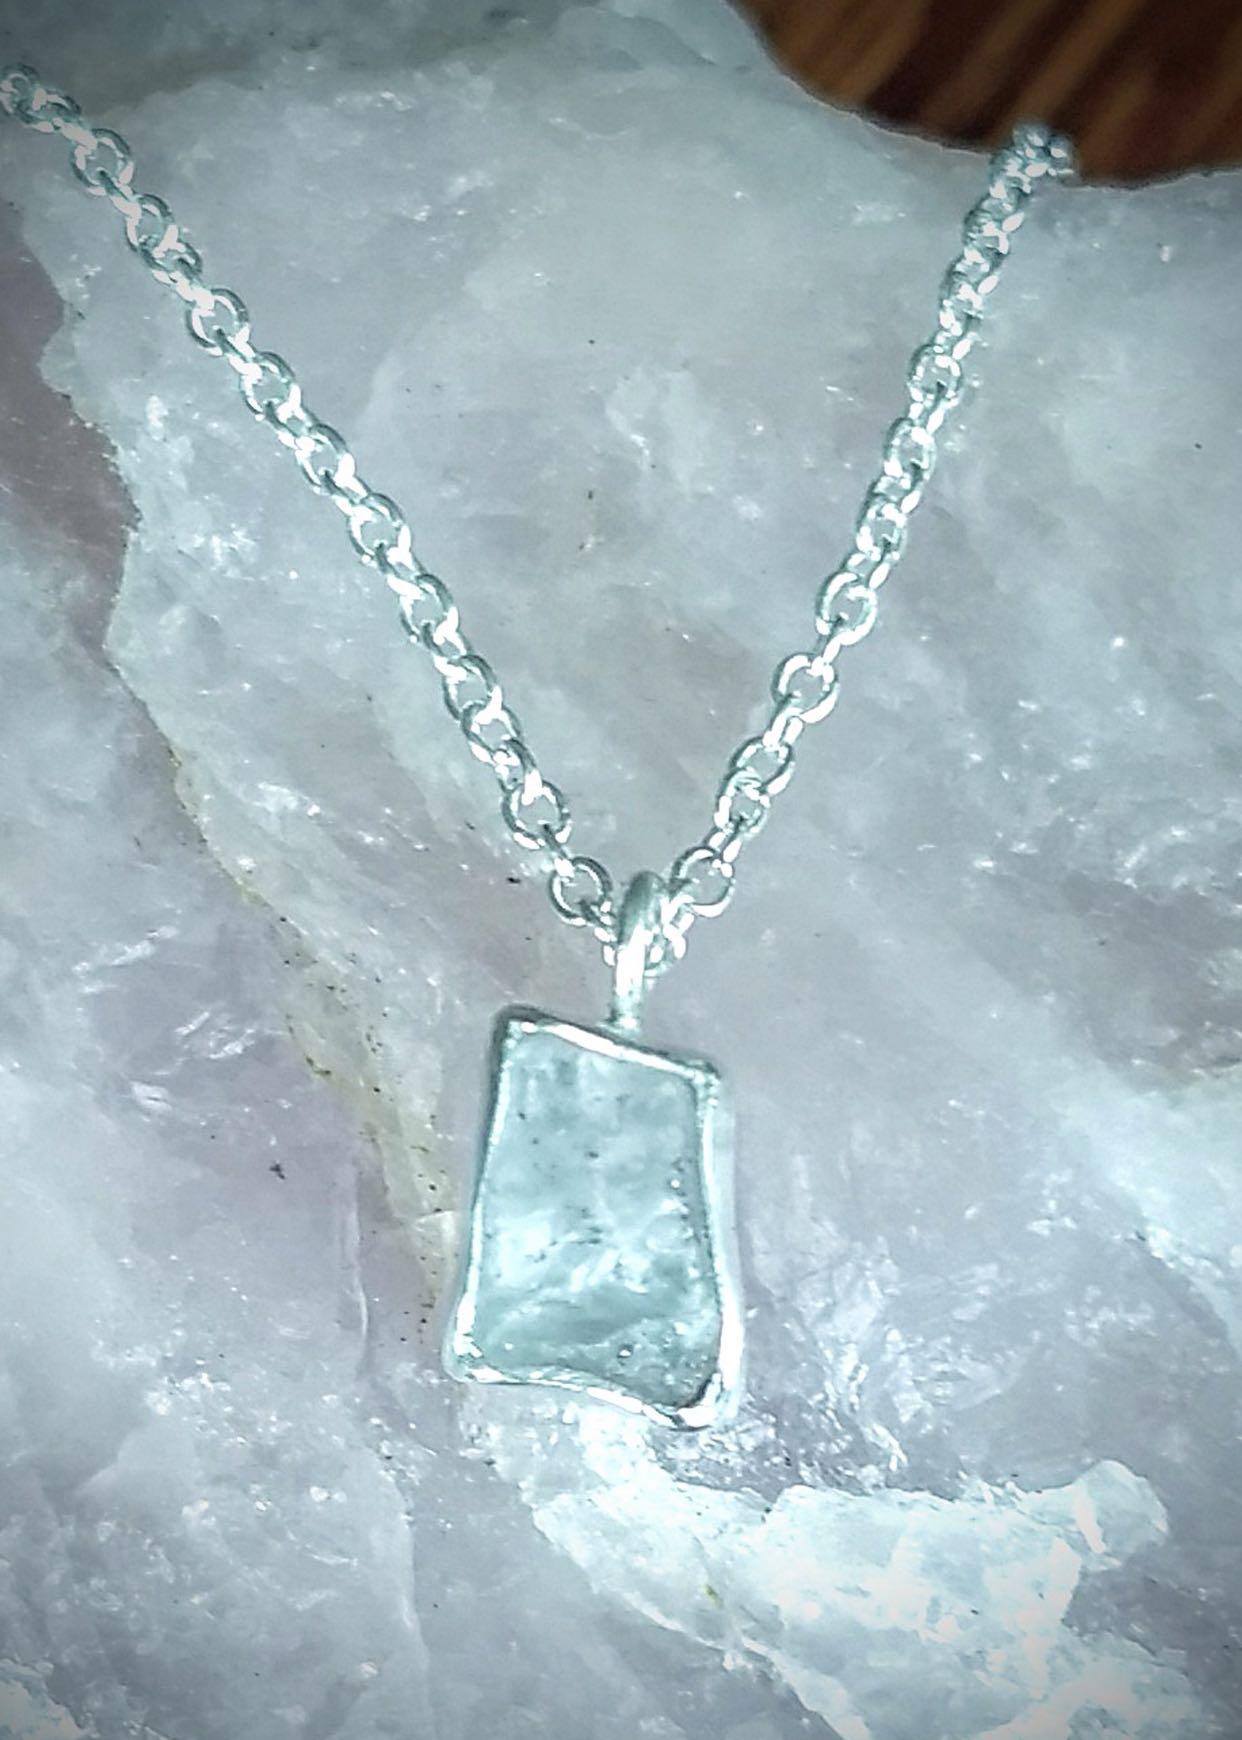 Sapphire pendant by Roni Downey   Value $200.-  Starting Bid $100.-